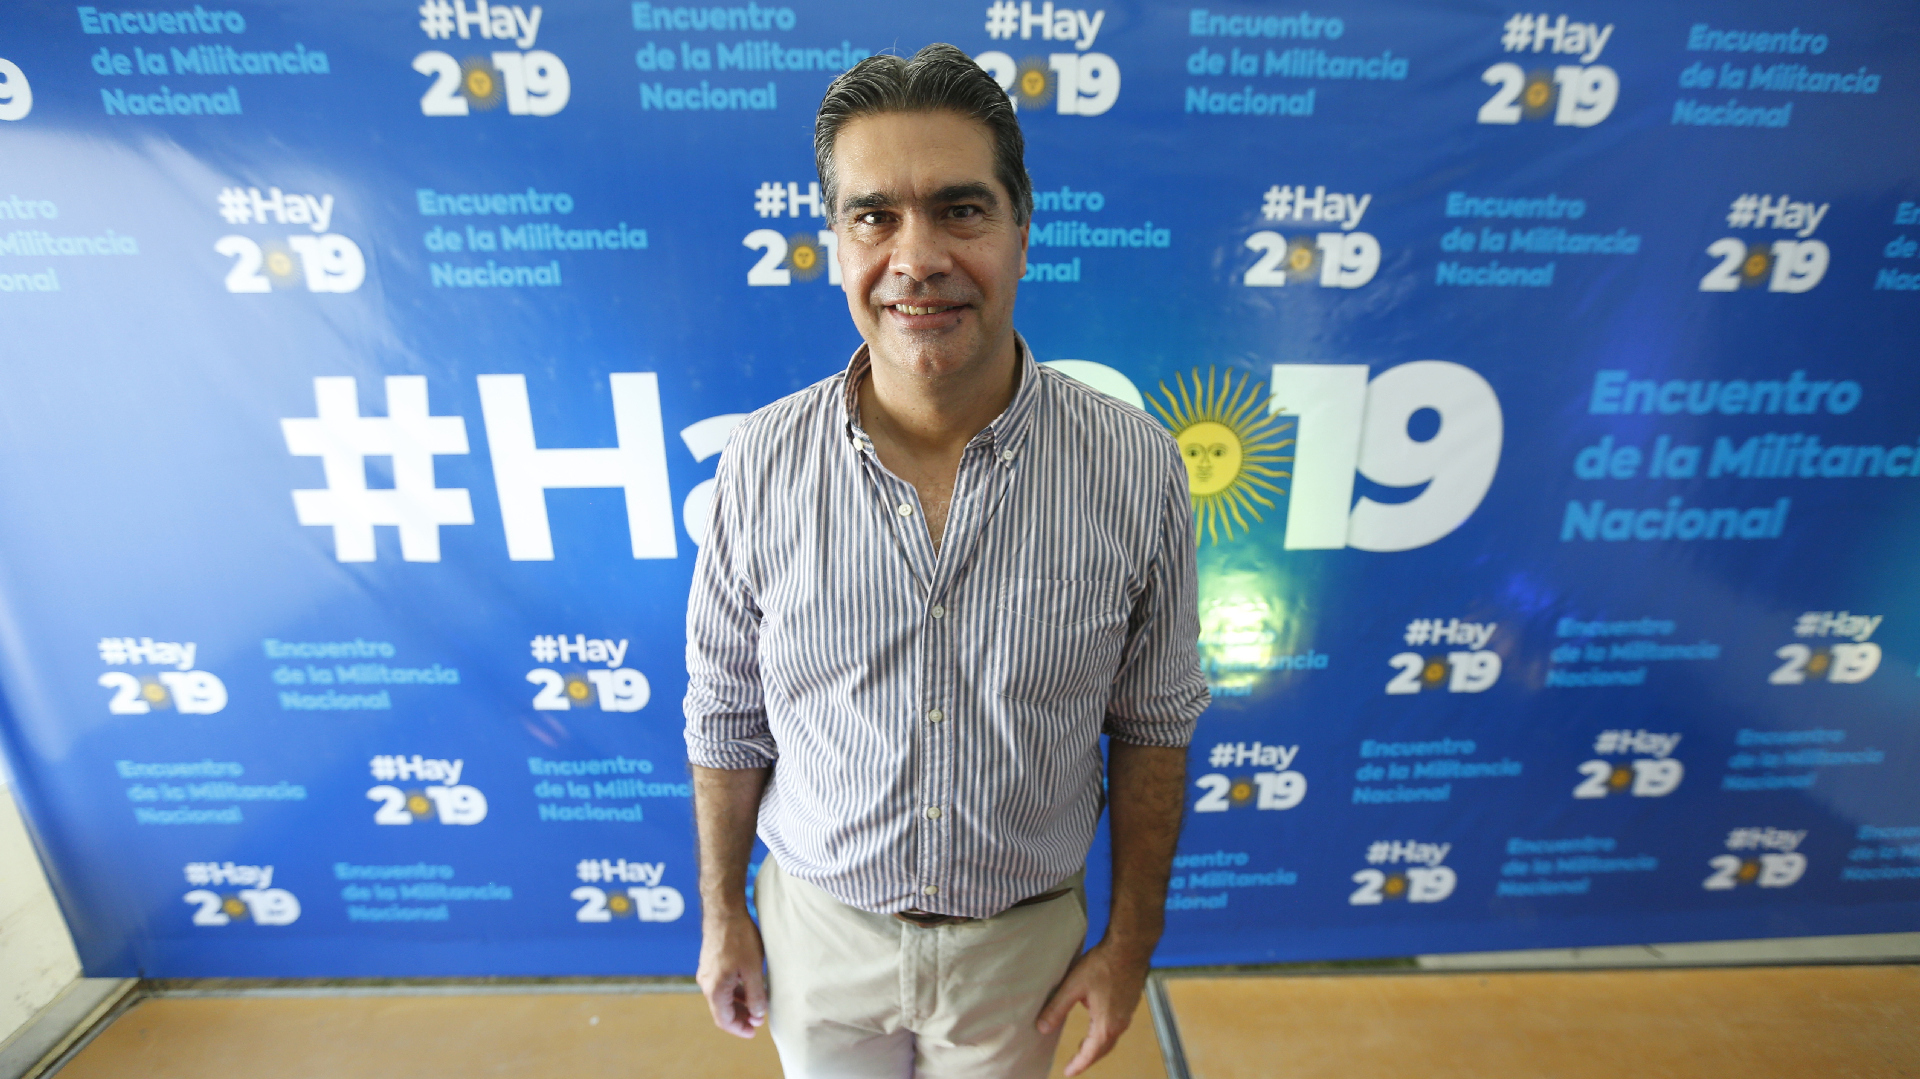 El intendente chaqueño Jorge Capitanich